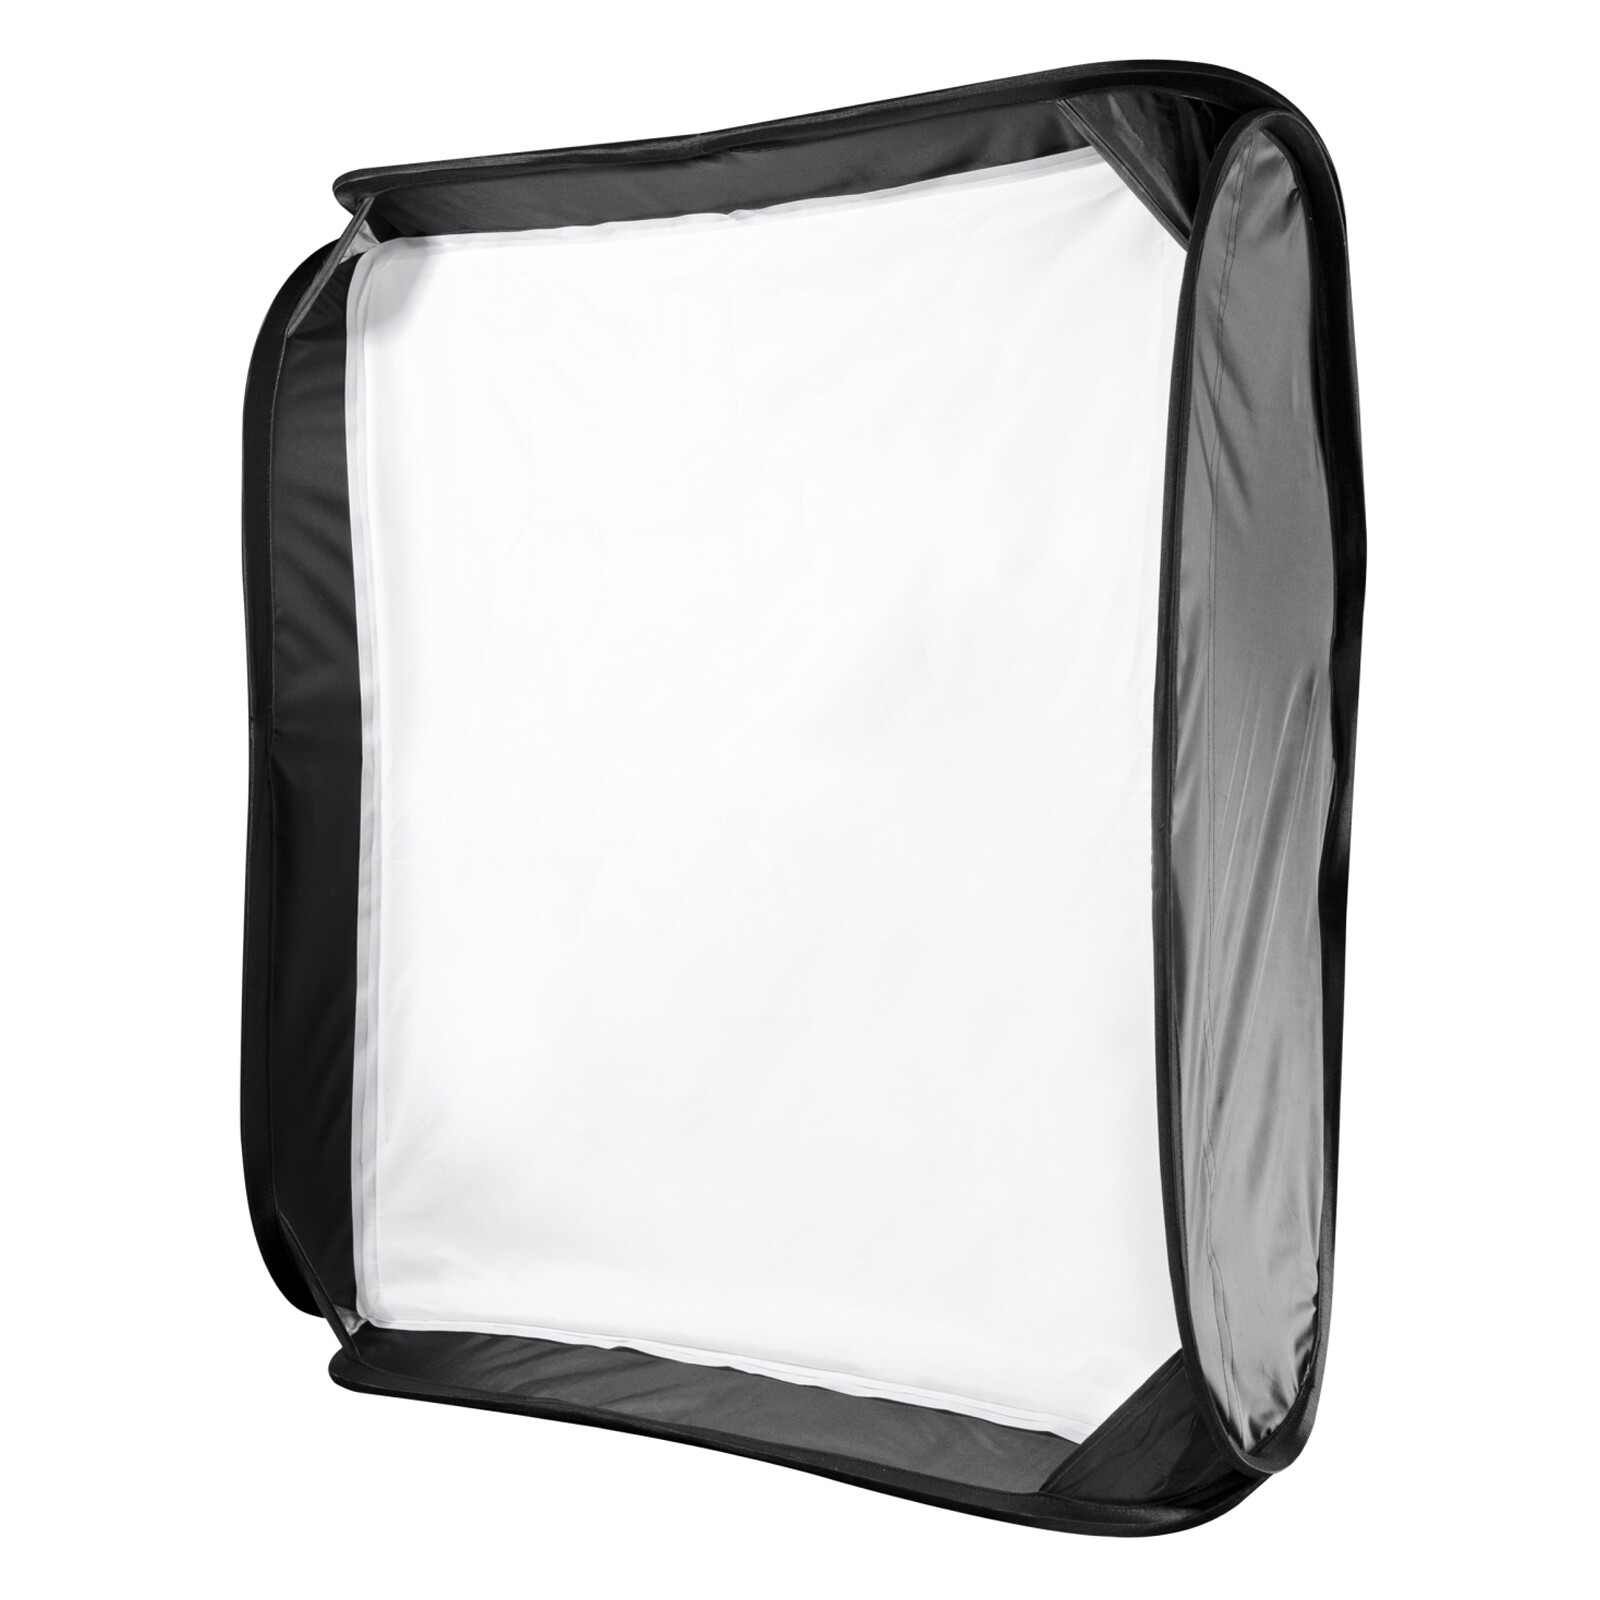 walimex pro Magic Softbox 40x40cm für Systemblitz